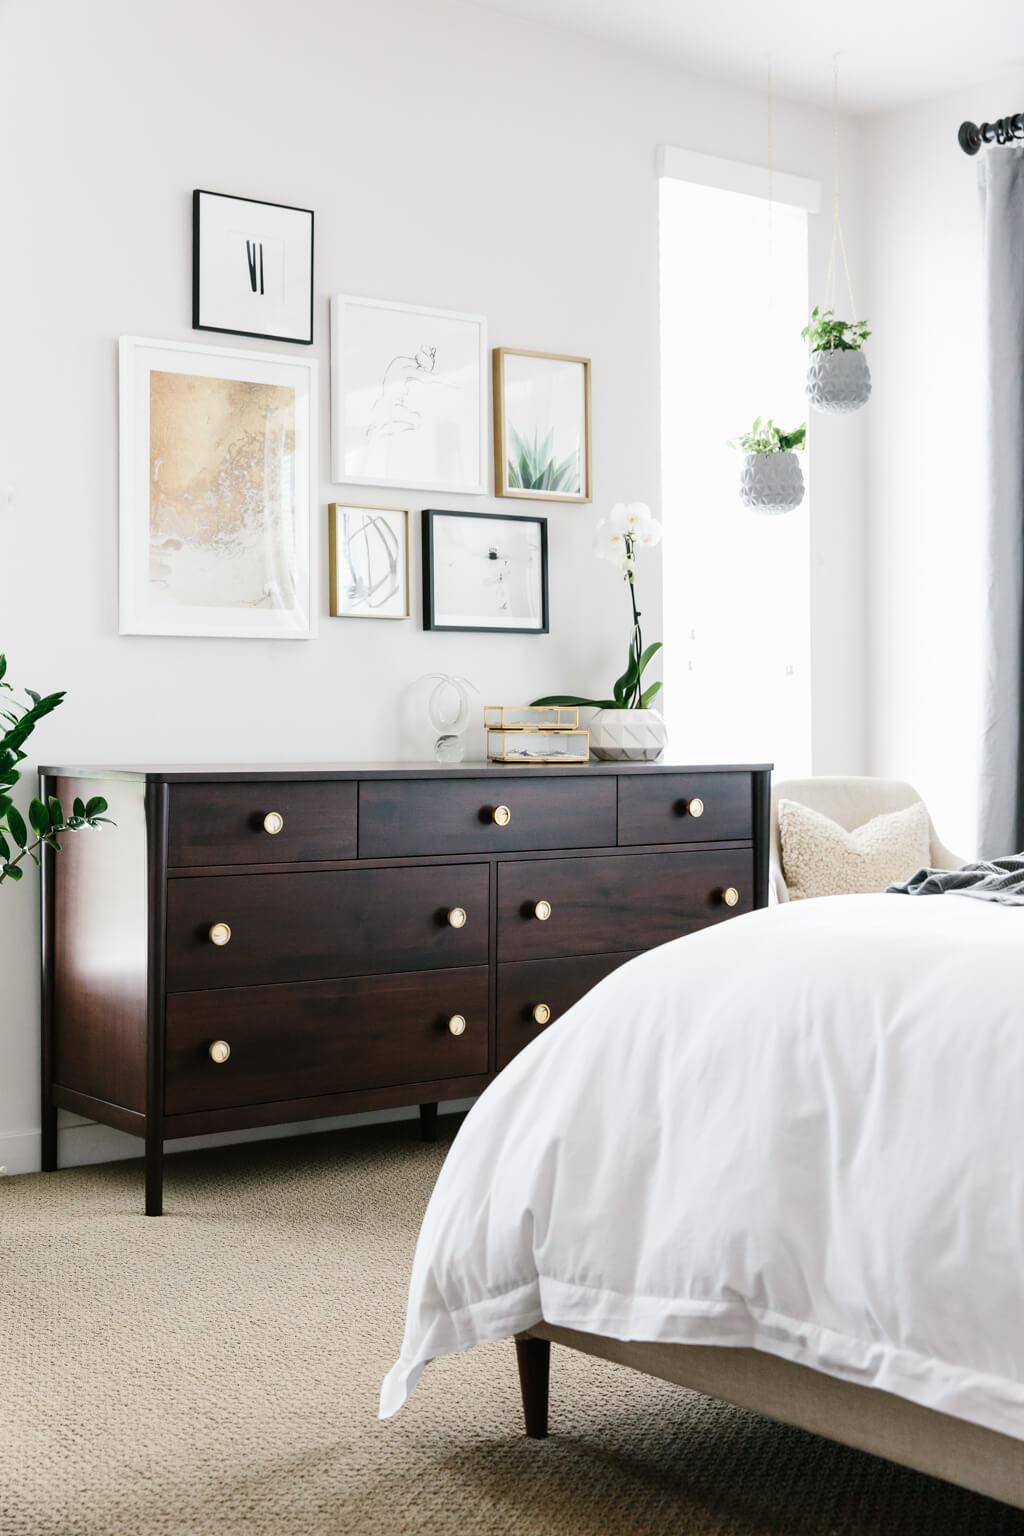 My Modern and Minimalist Bedroom Design with Havenly ... on Minimalist Bedroom Ideas  id=20304